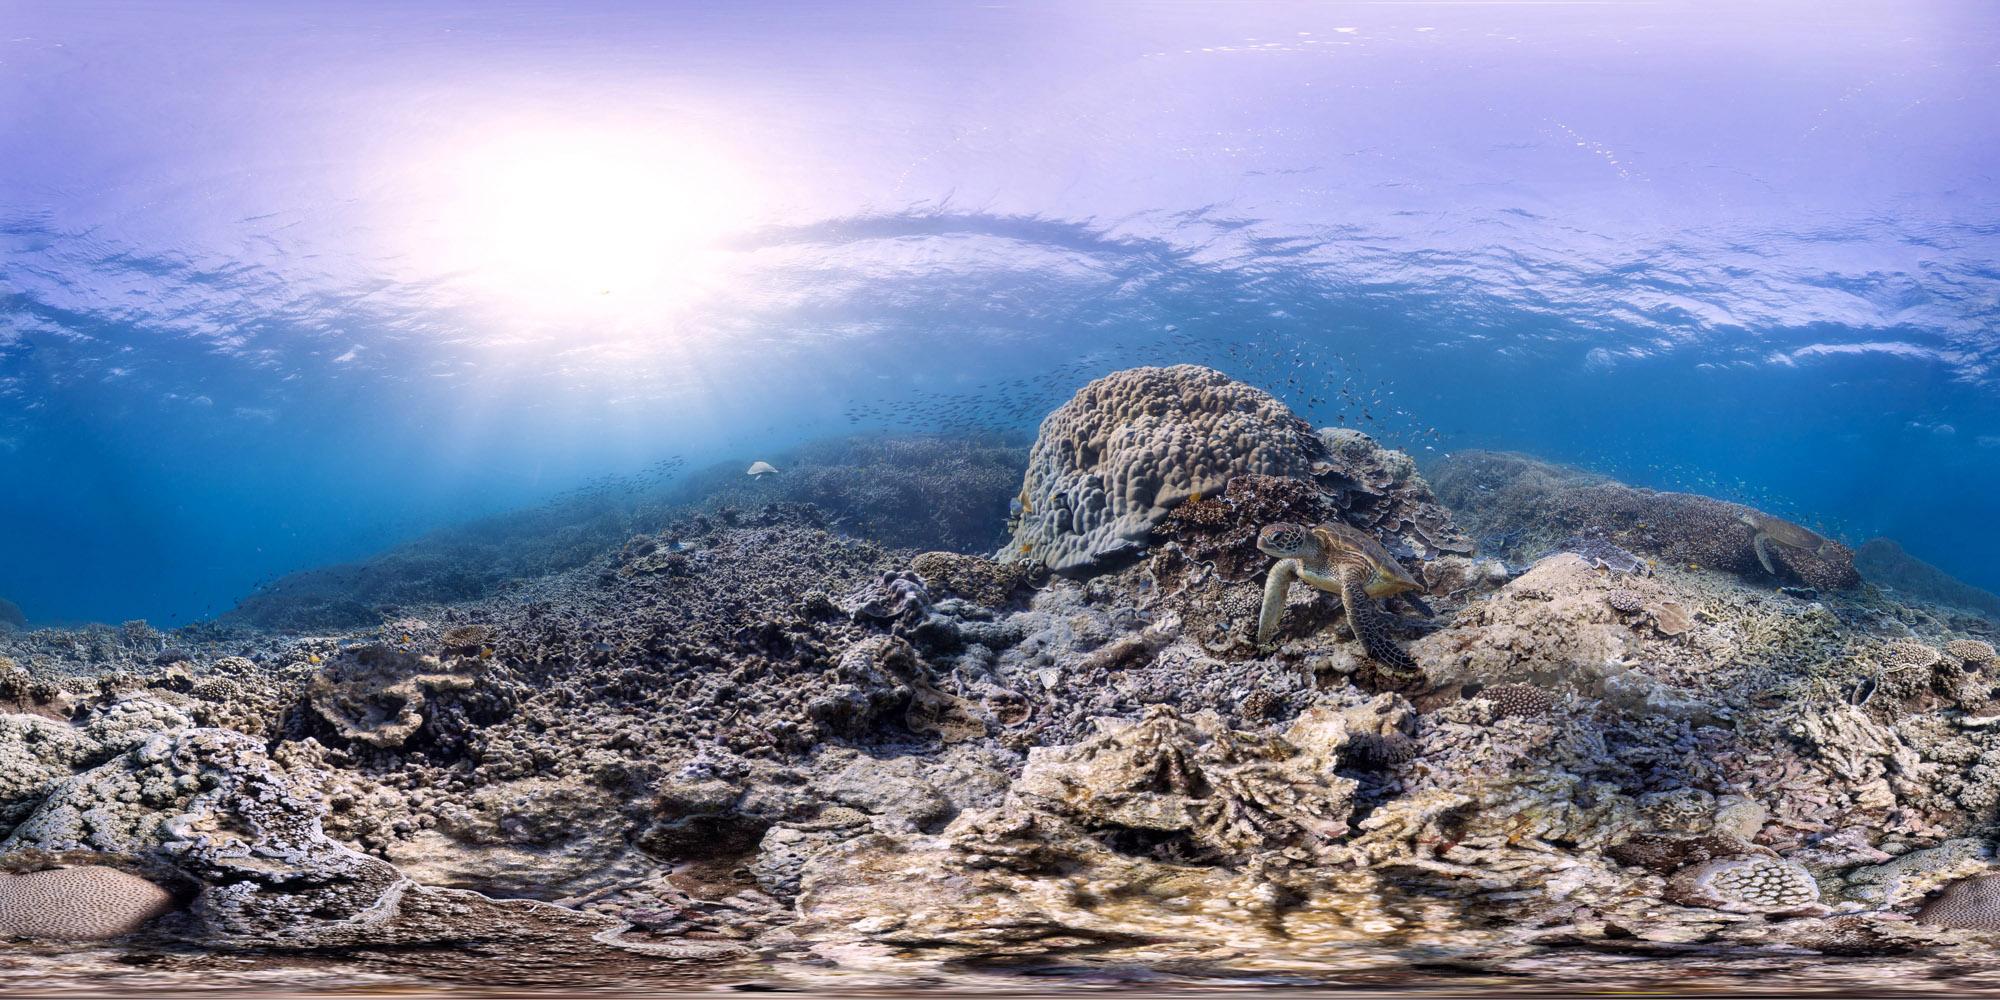 Underwater Heron Island